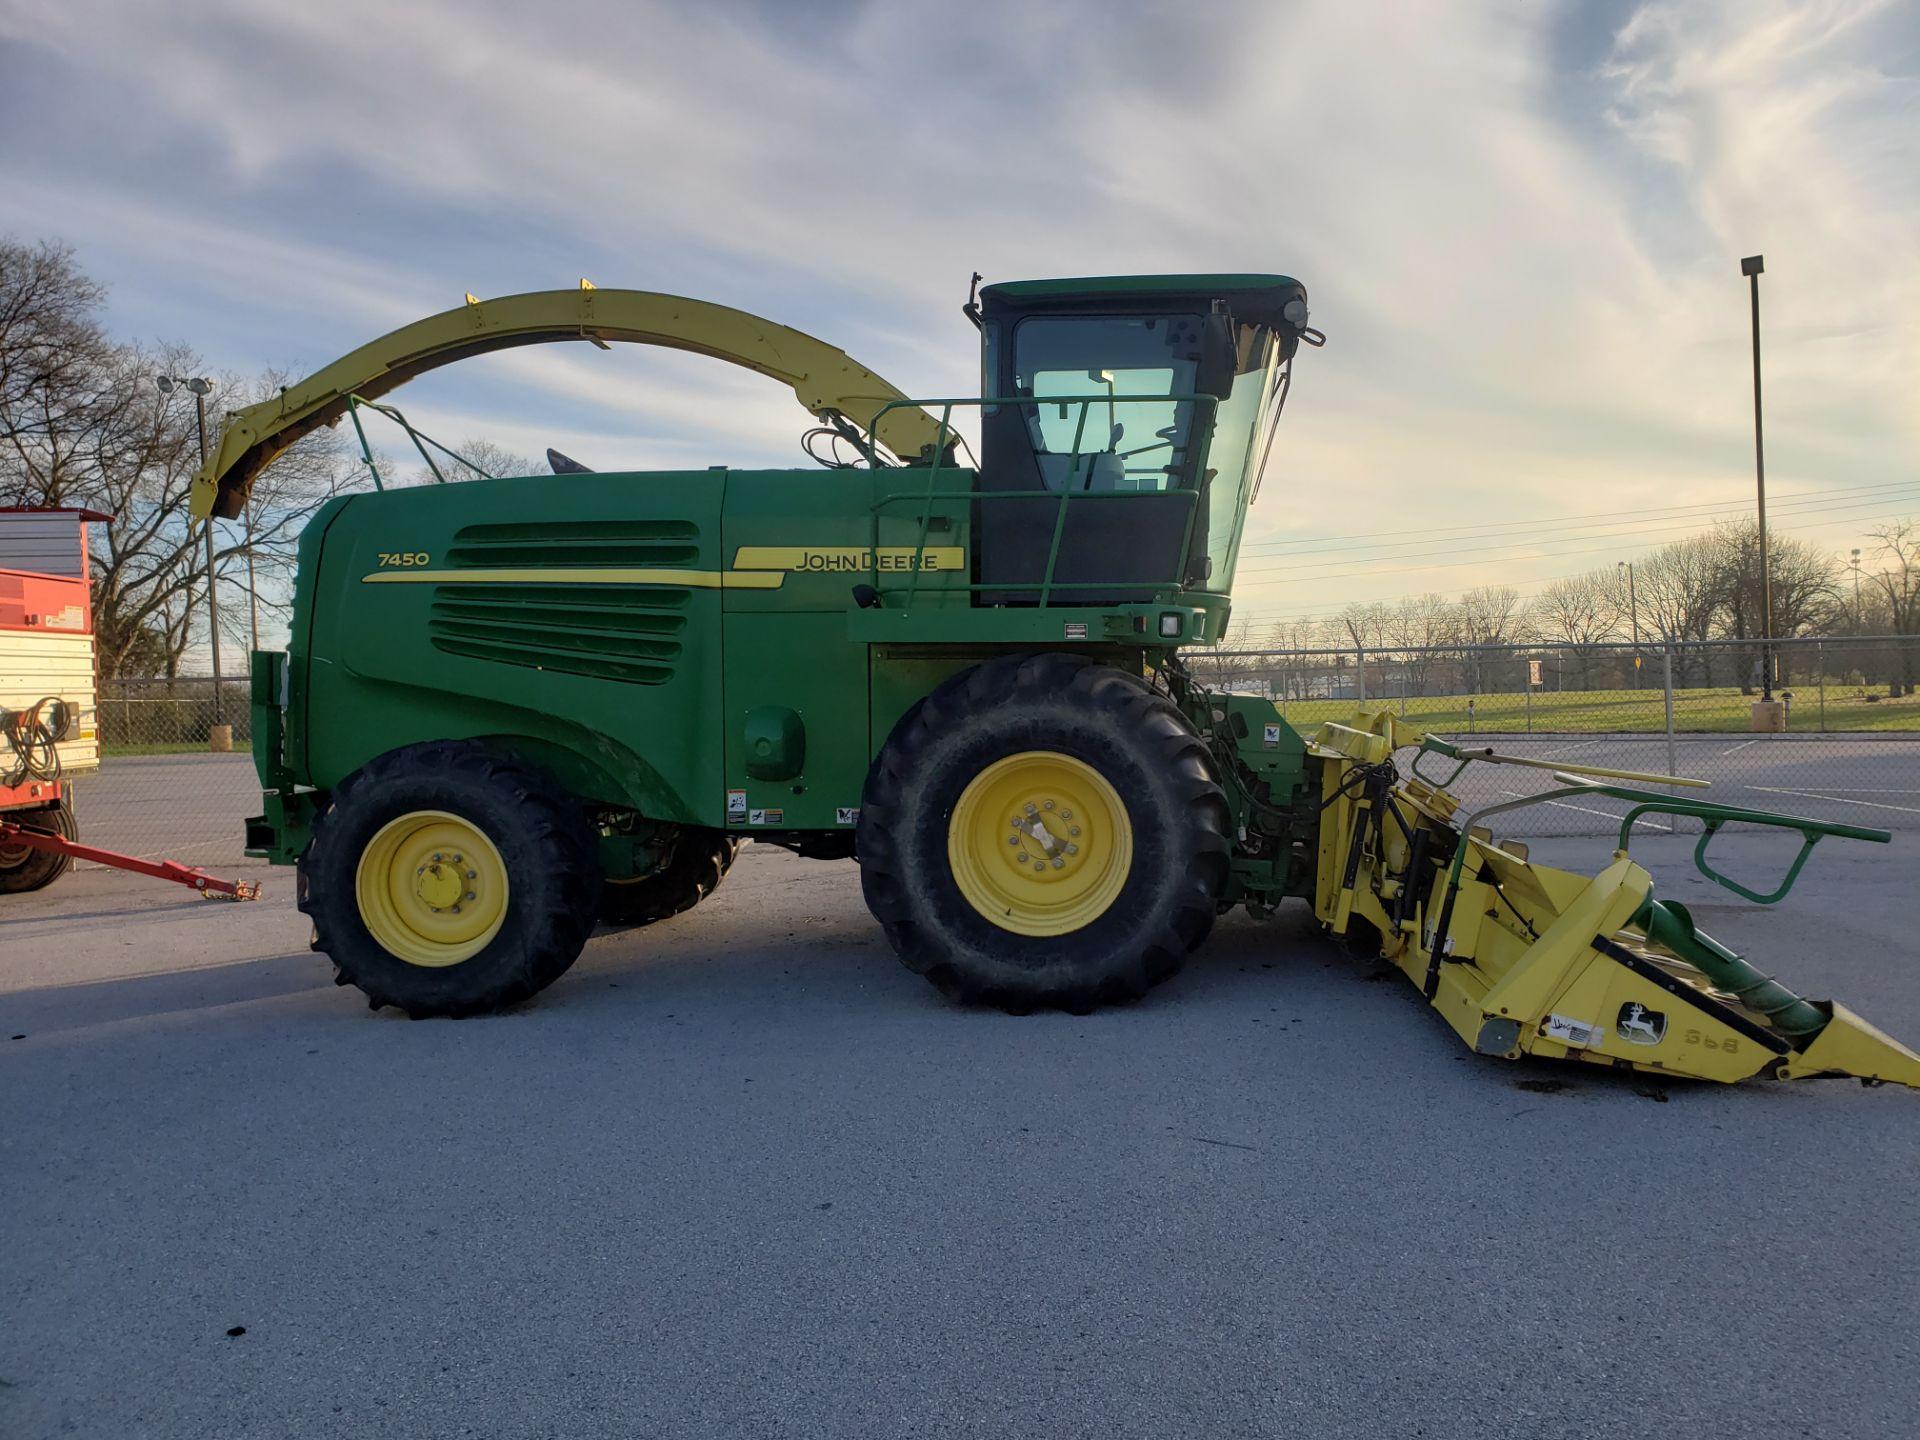 Used-John Deere 7450 Tractor. Model 7450. 1881 hrs. 688 Chopper Head - Image 2 of 10